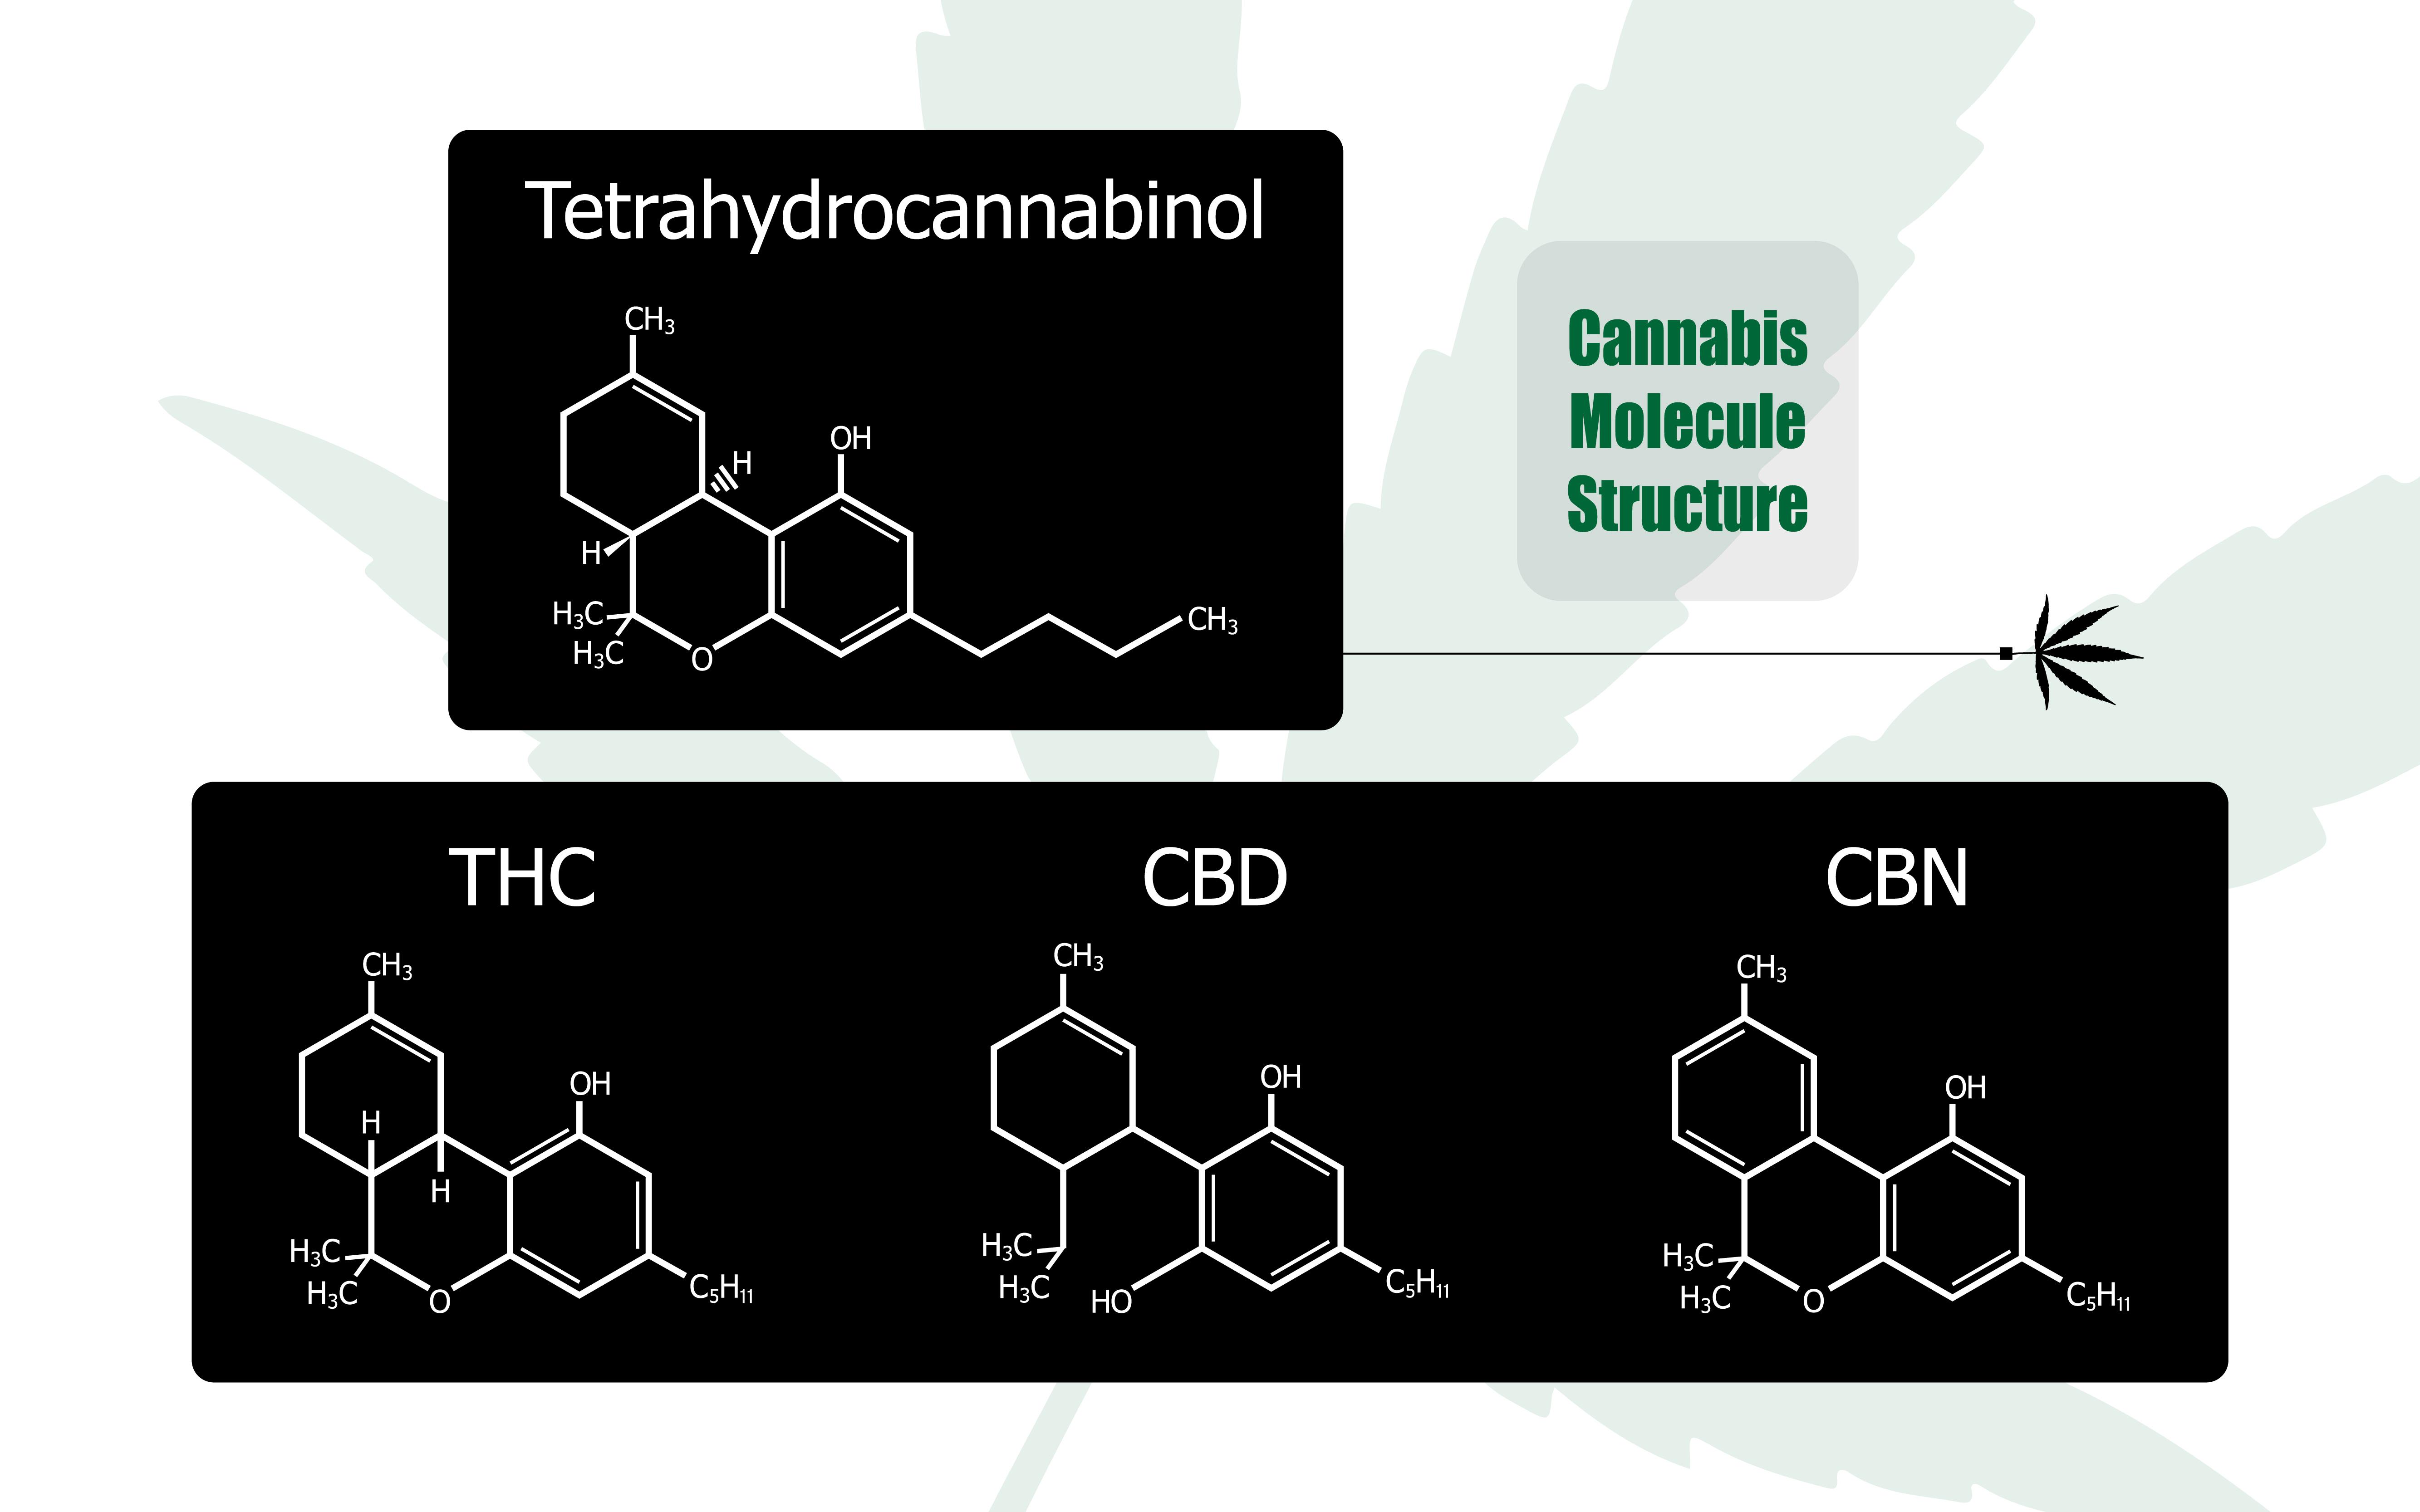 CBD THC entourage effect tegengaat symbiose immuunsysteem psyche cannabis medische marihuana cannabinoïde endocannabinoïde moduleren